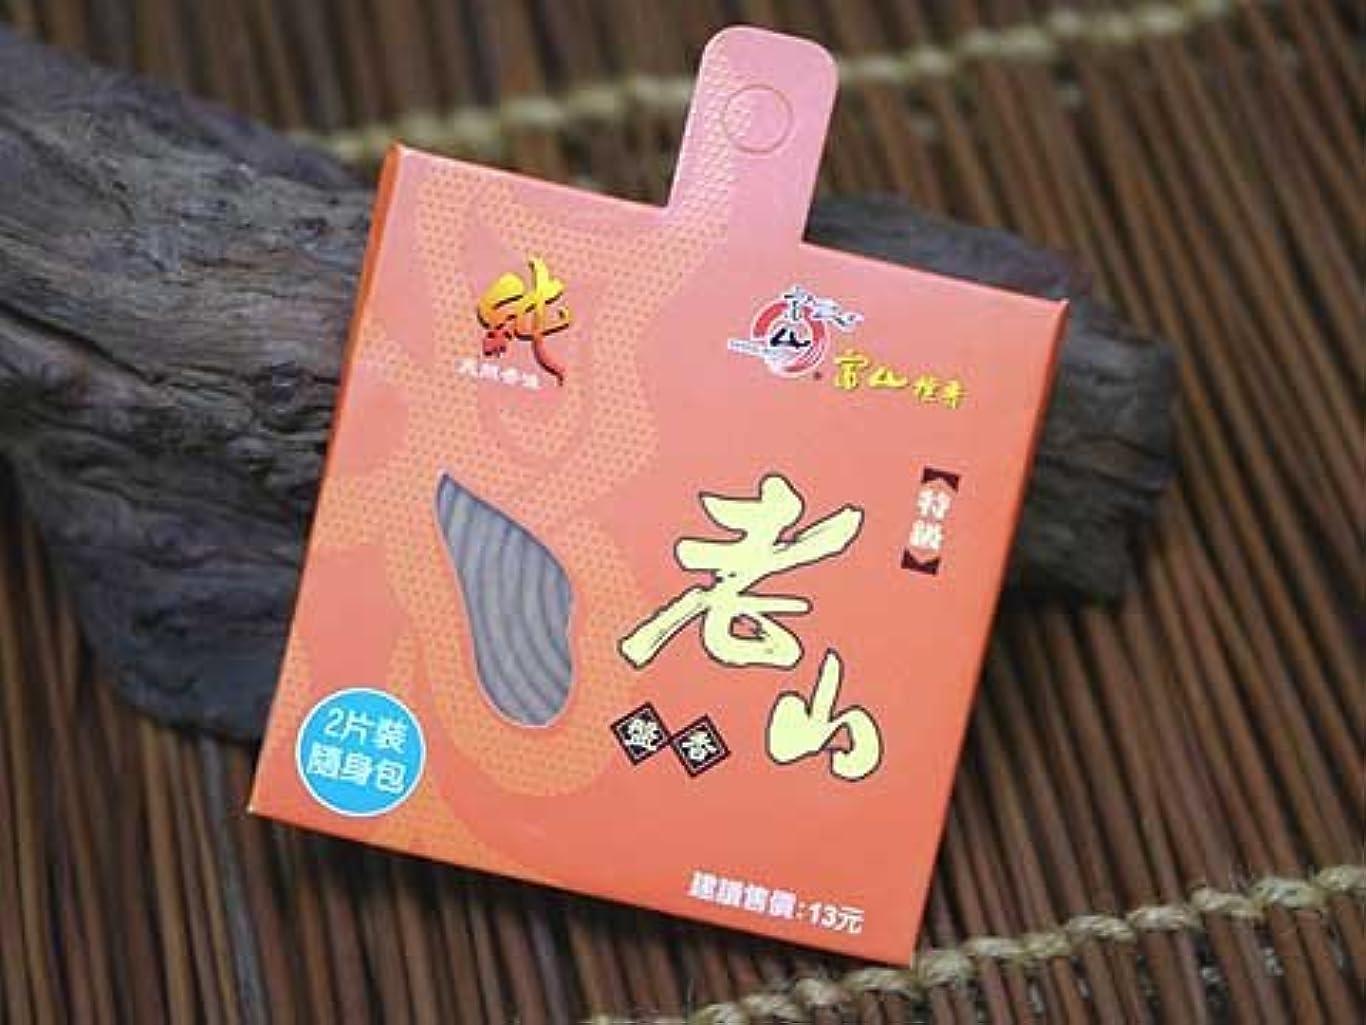 土砂降り一致する派手富山檀香 台湾のお香 富山檀香 特級老山盤香2巻